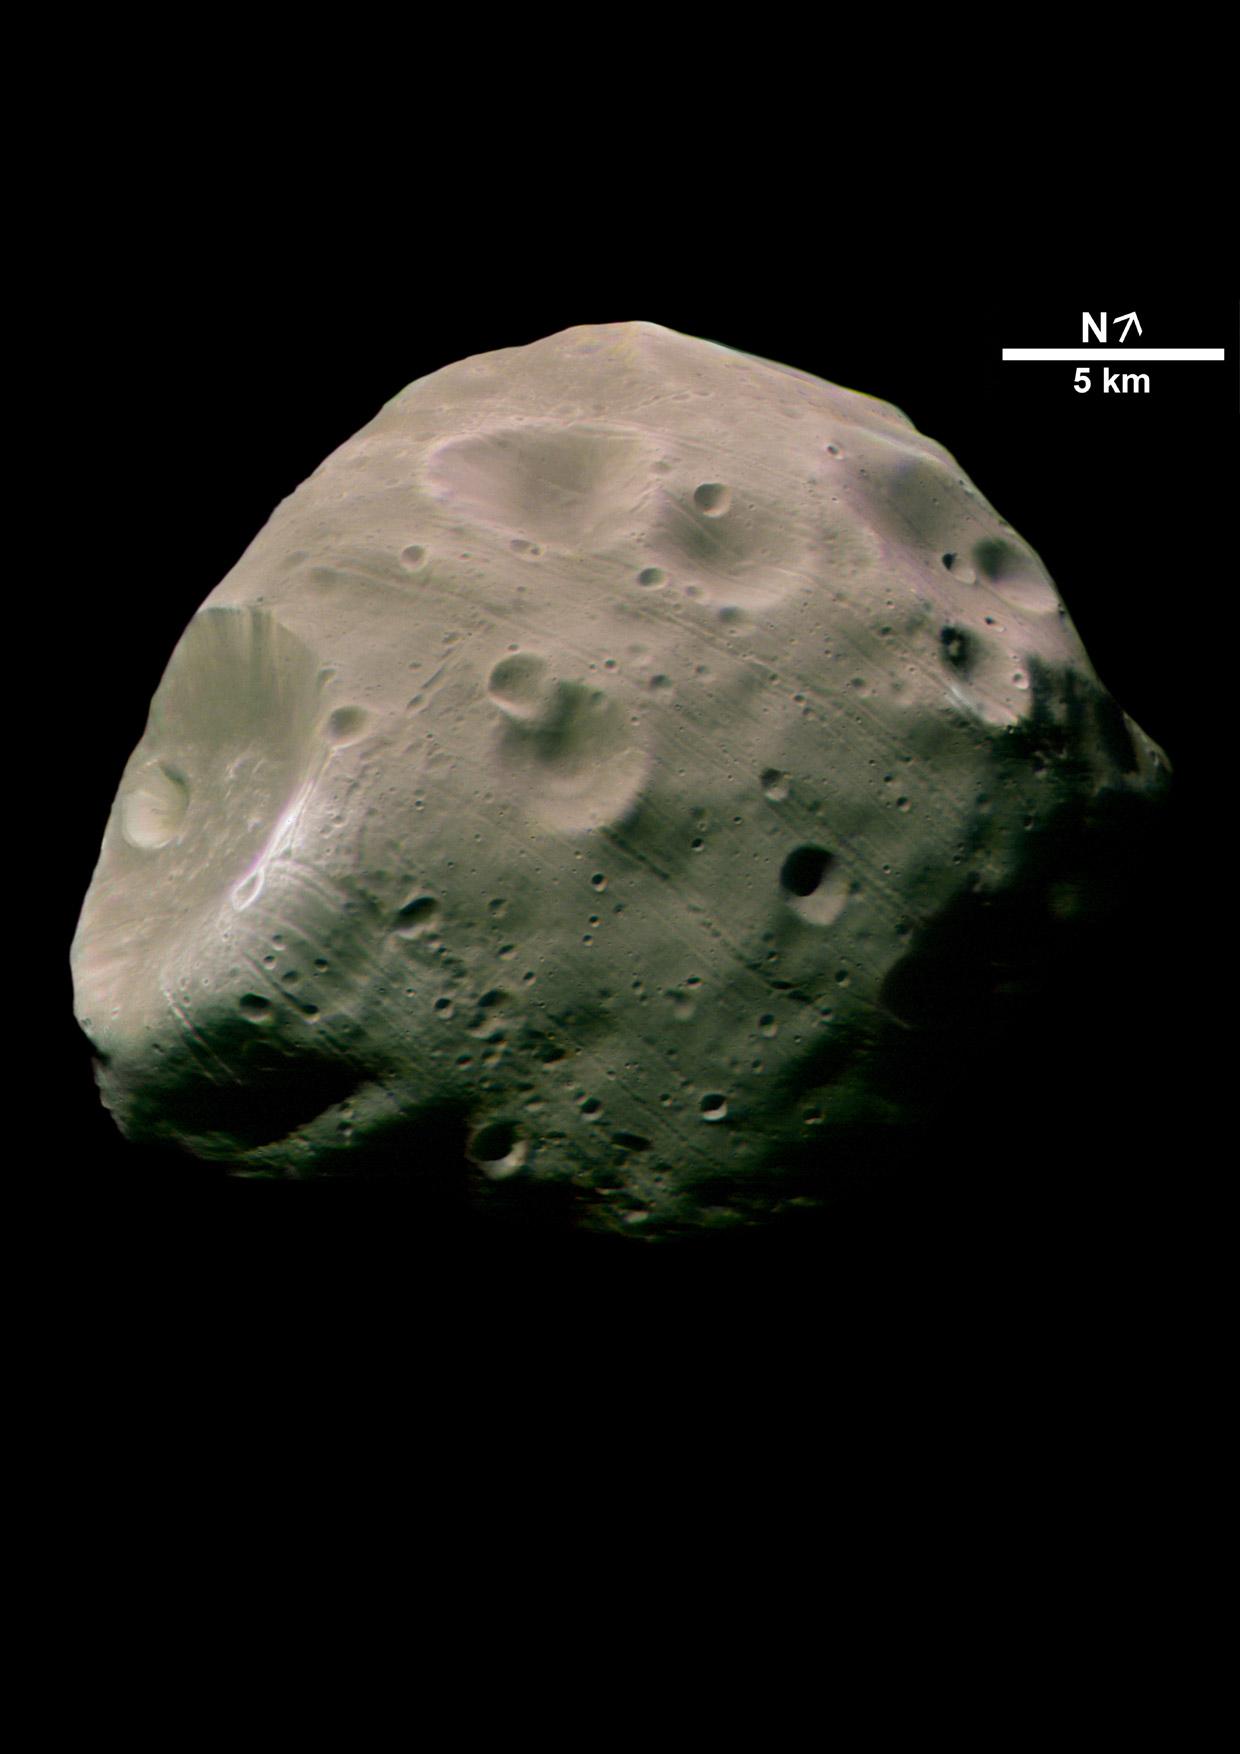 Mars Express - Phobos im Jahre 2004, Quelle: ESA/DLR/FU Berlin